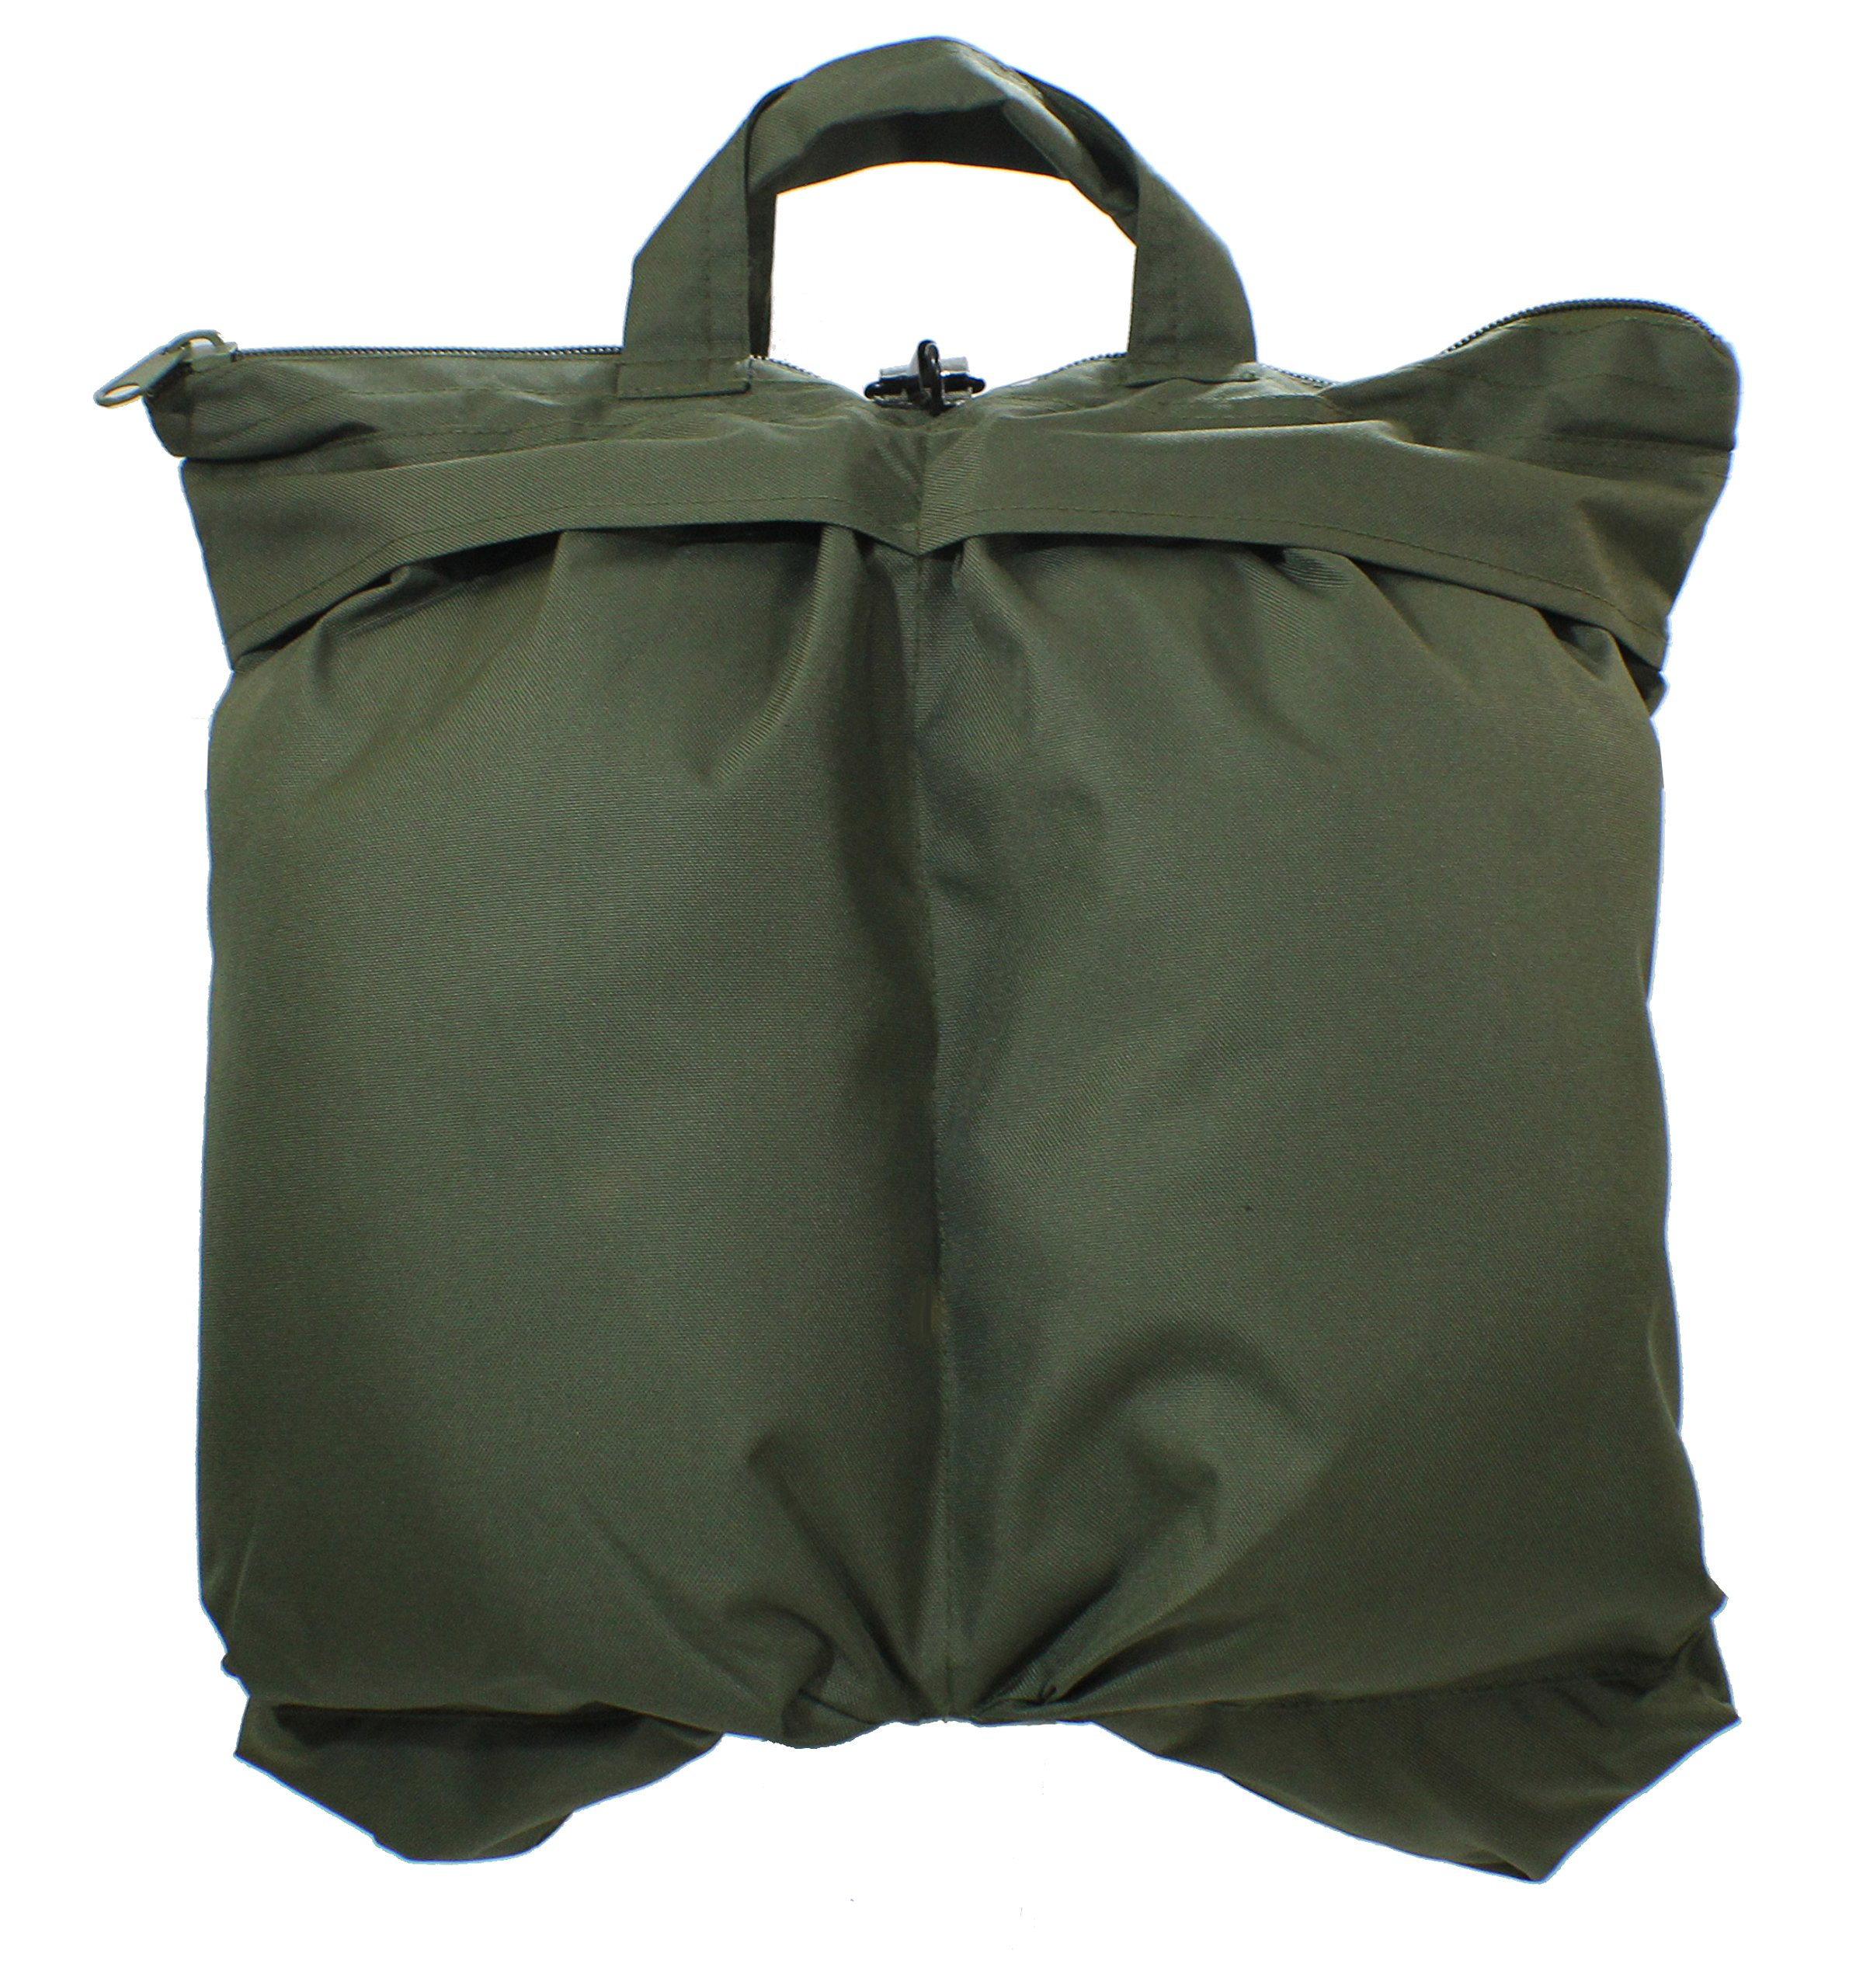 Mil-Tec Pilot's Helmet Bag with Strap - Olive Drab by Mil-Tec